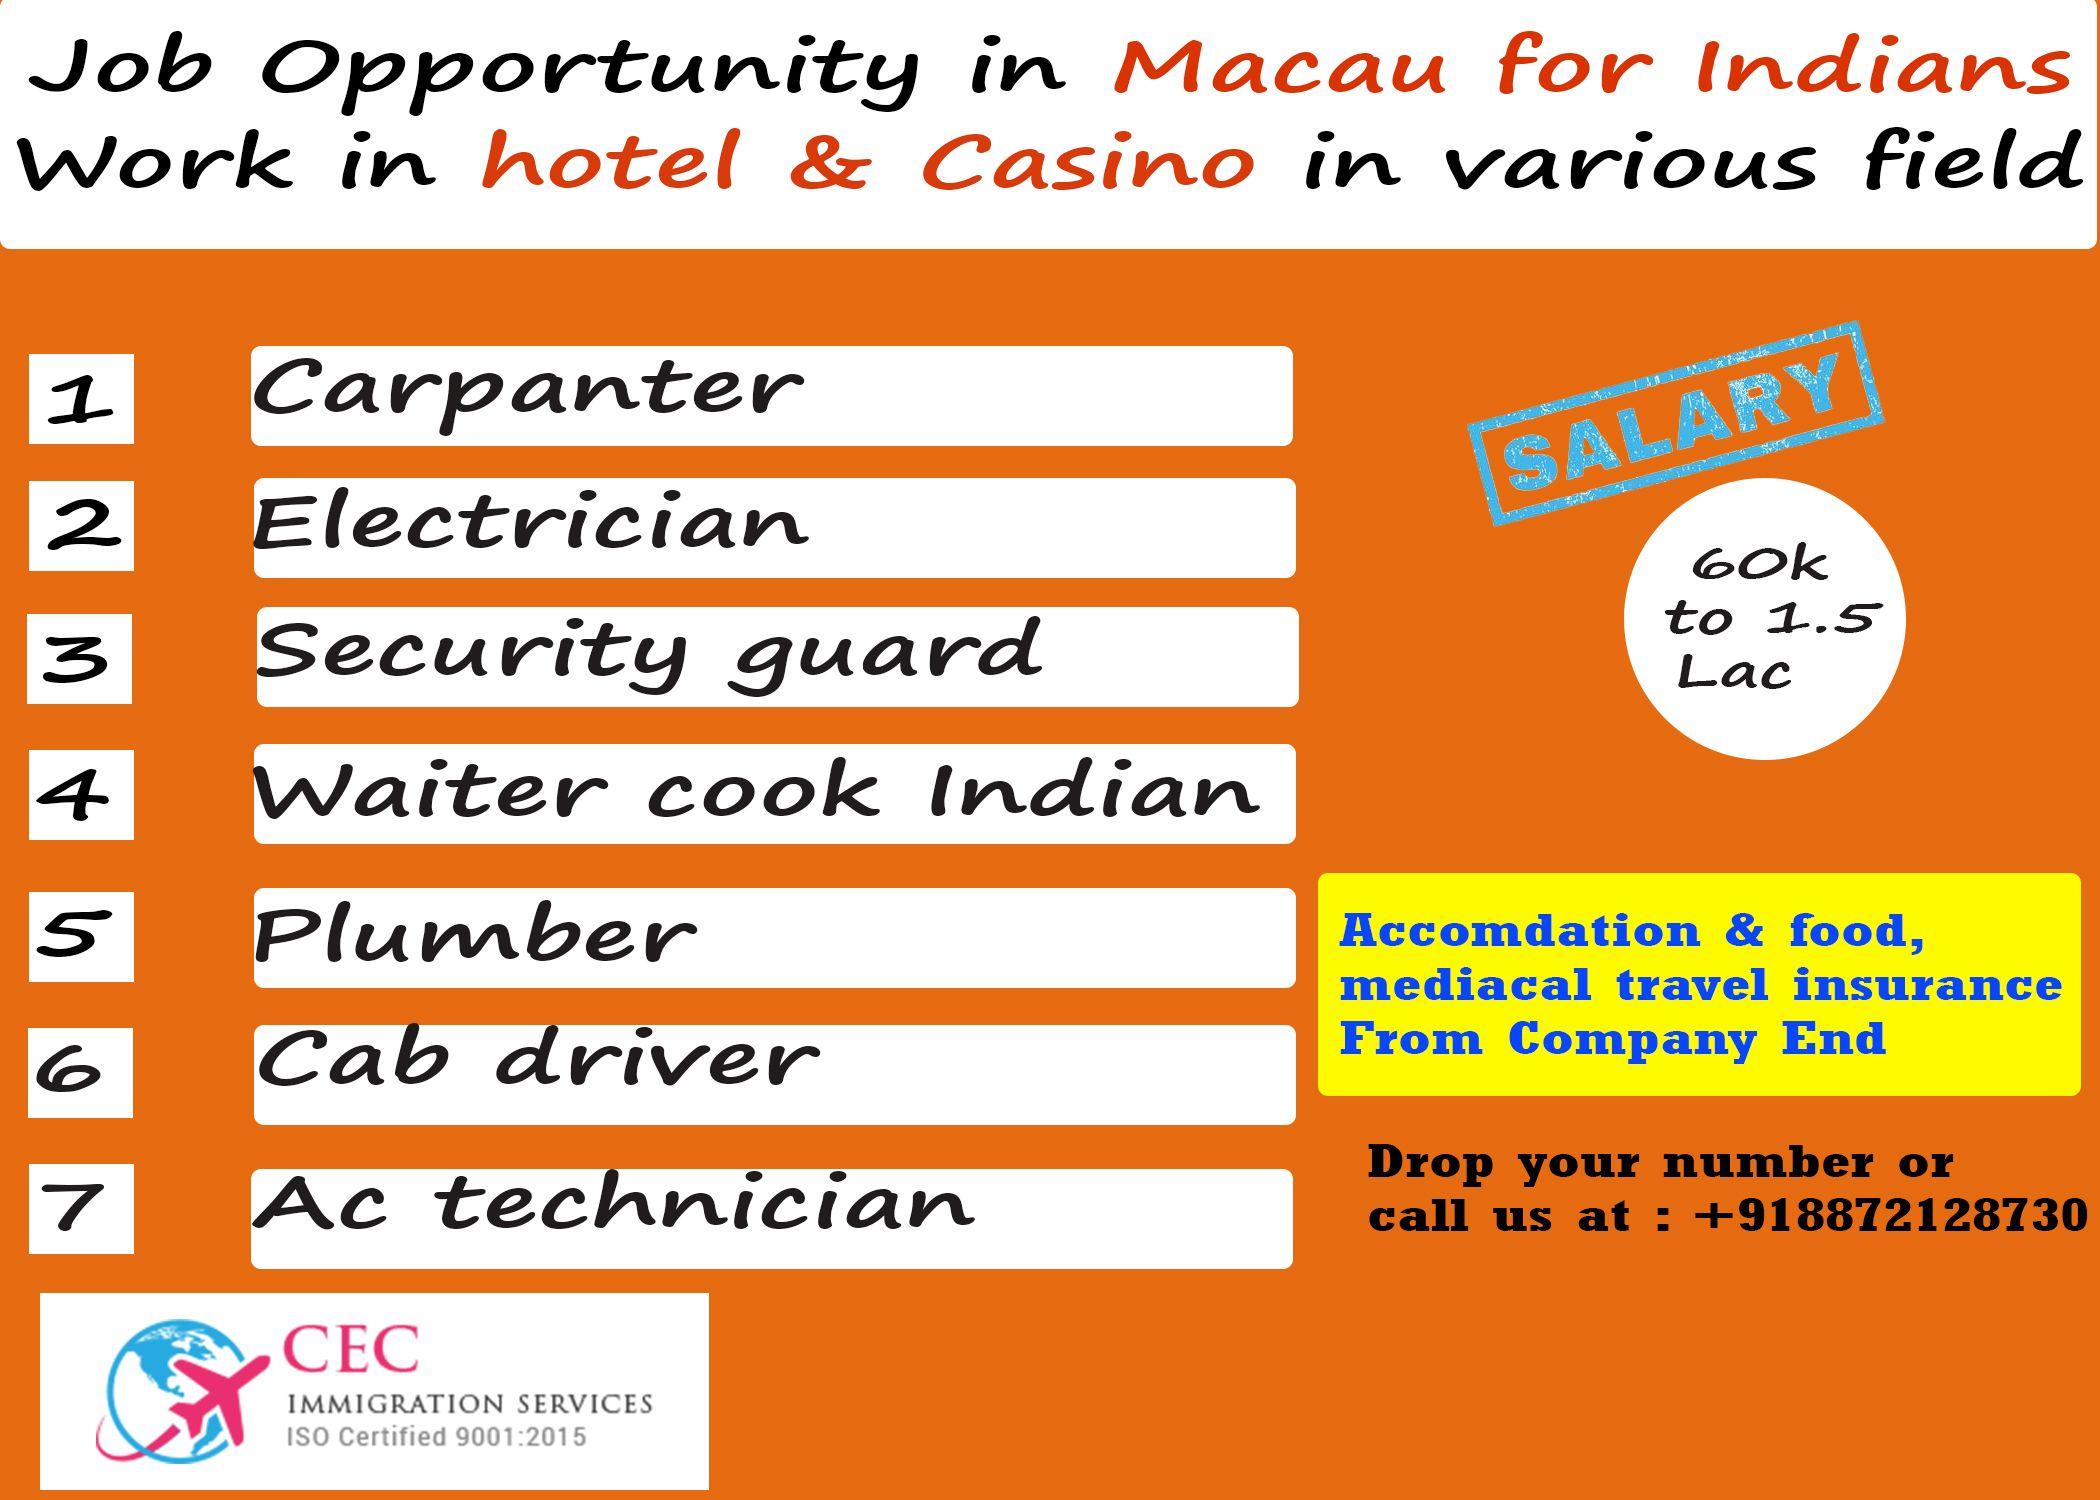 job oppurtunity in Macau Work in hotel & Casnio in